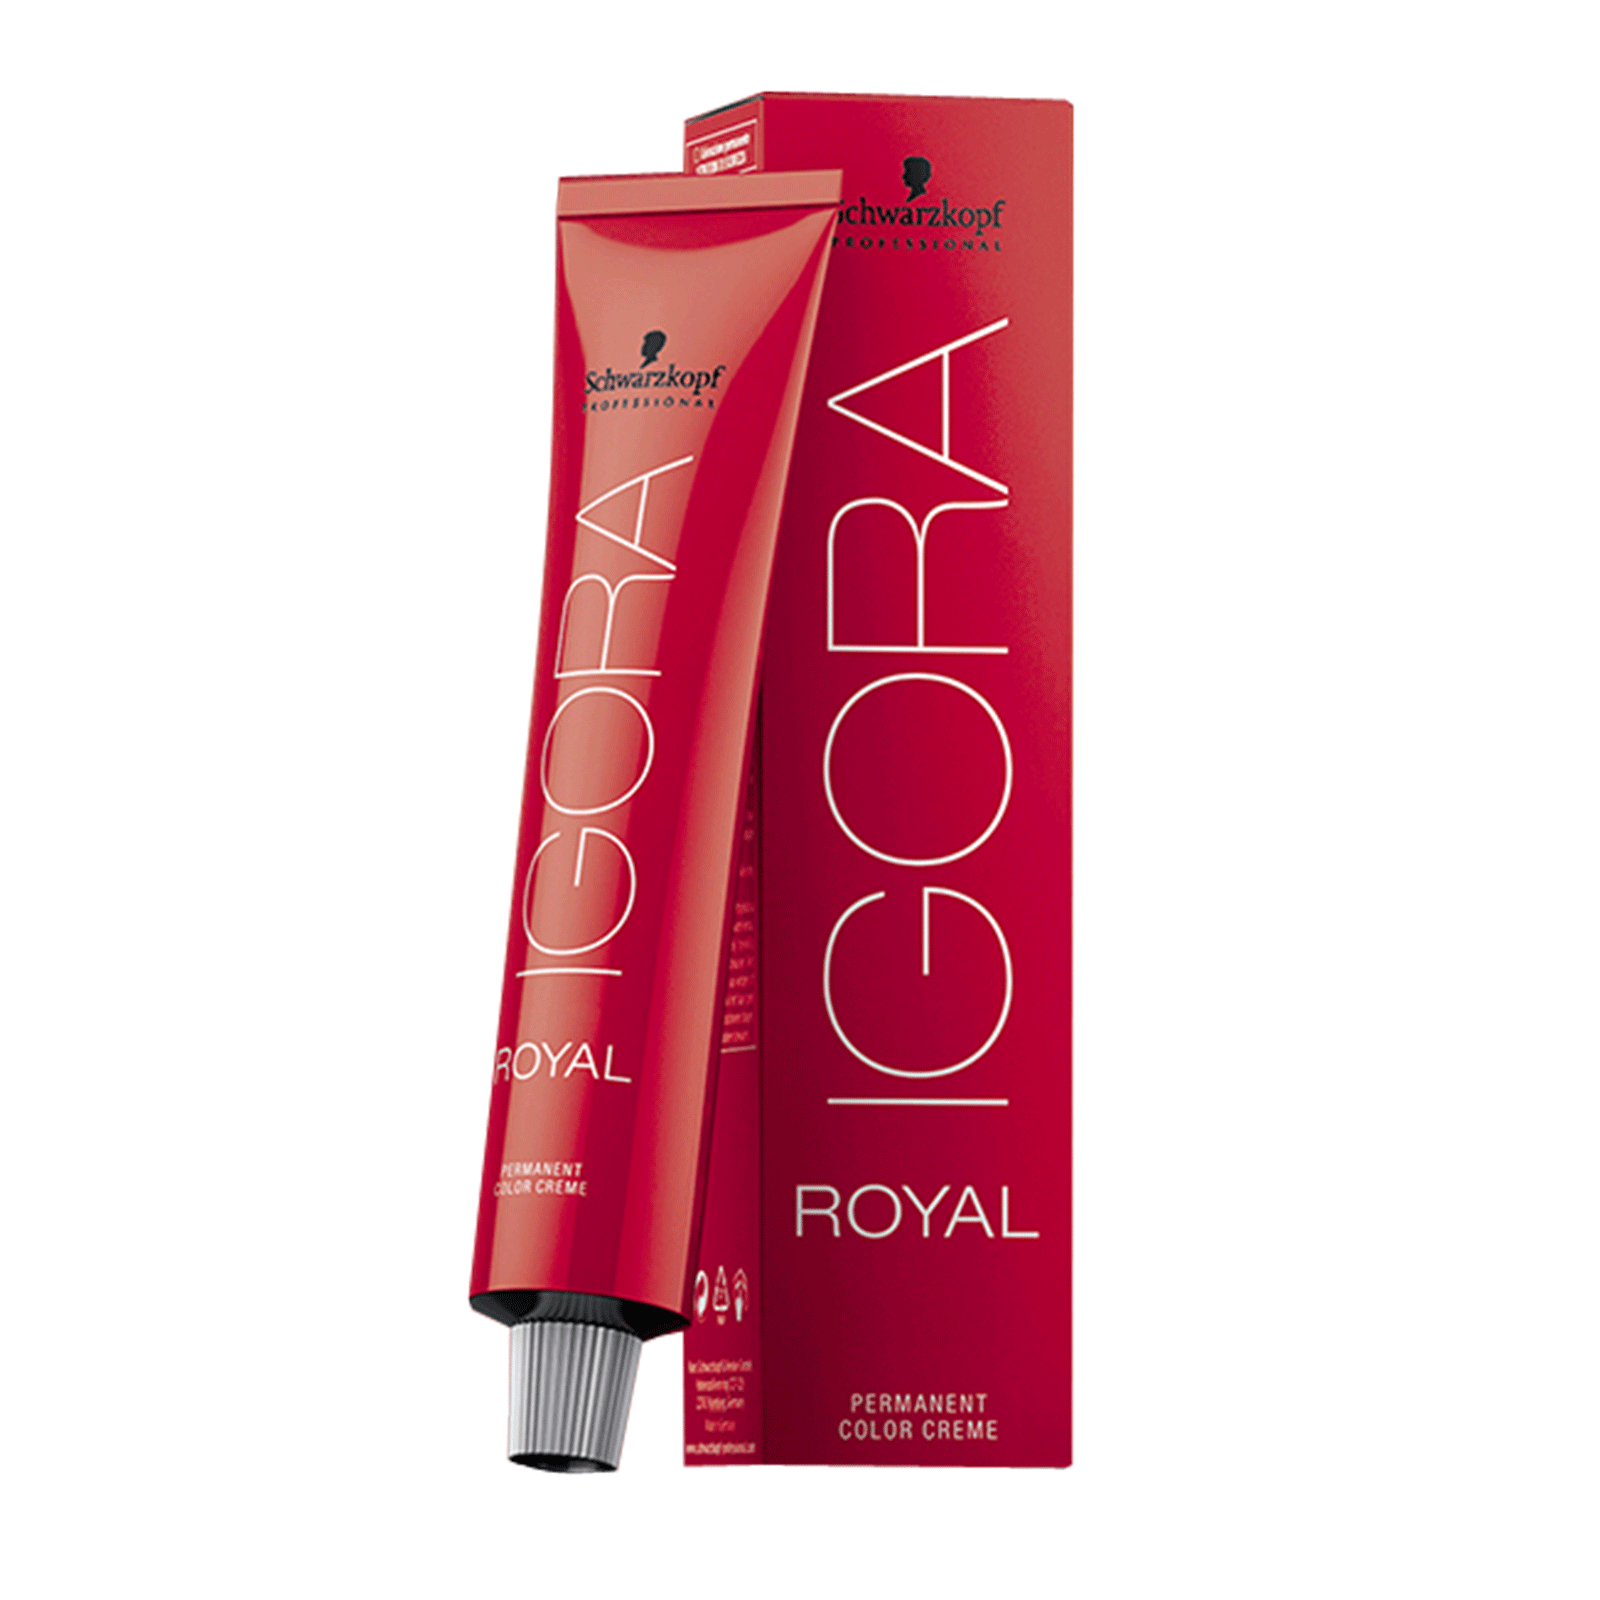 Igora Royal Permanent Color Schwarzkopf Professional Cosmoprof